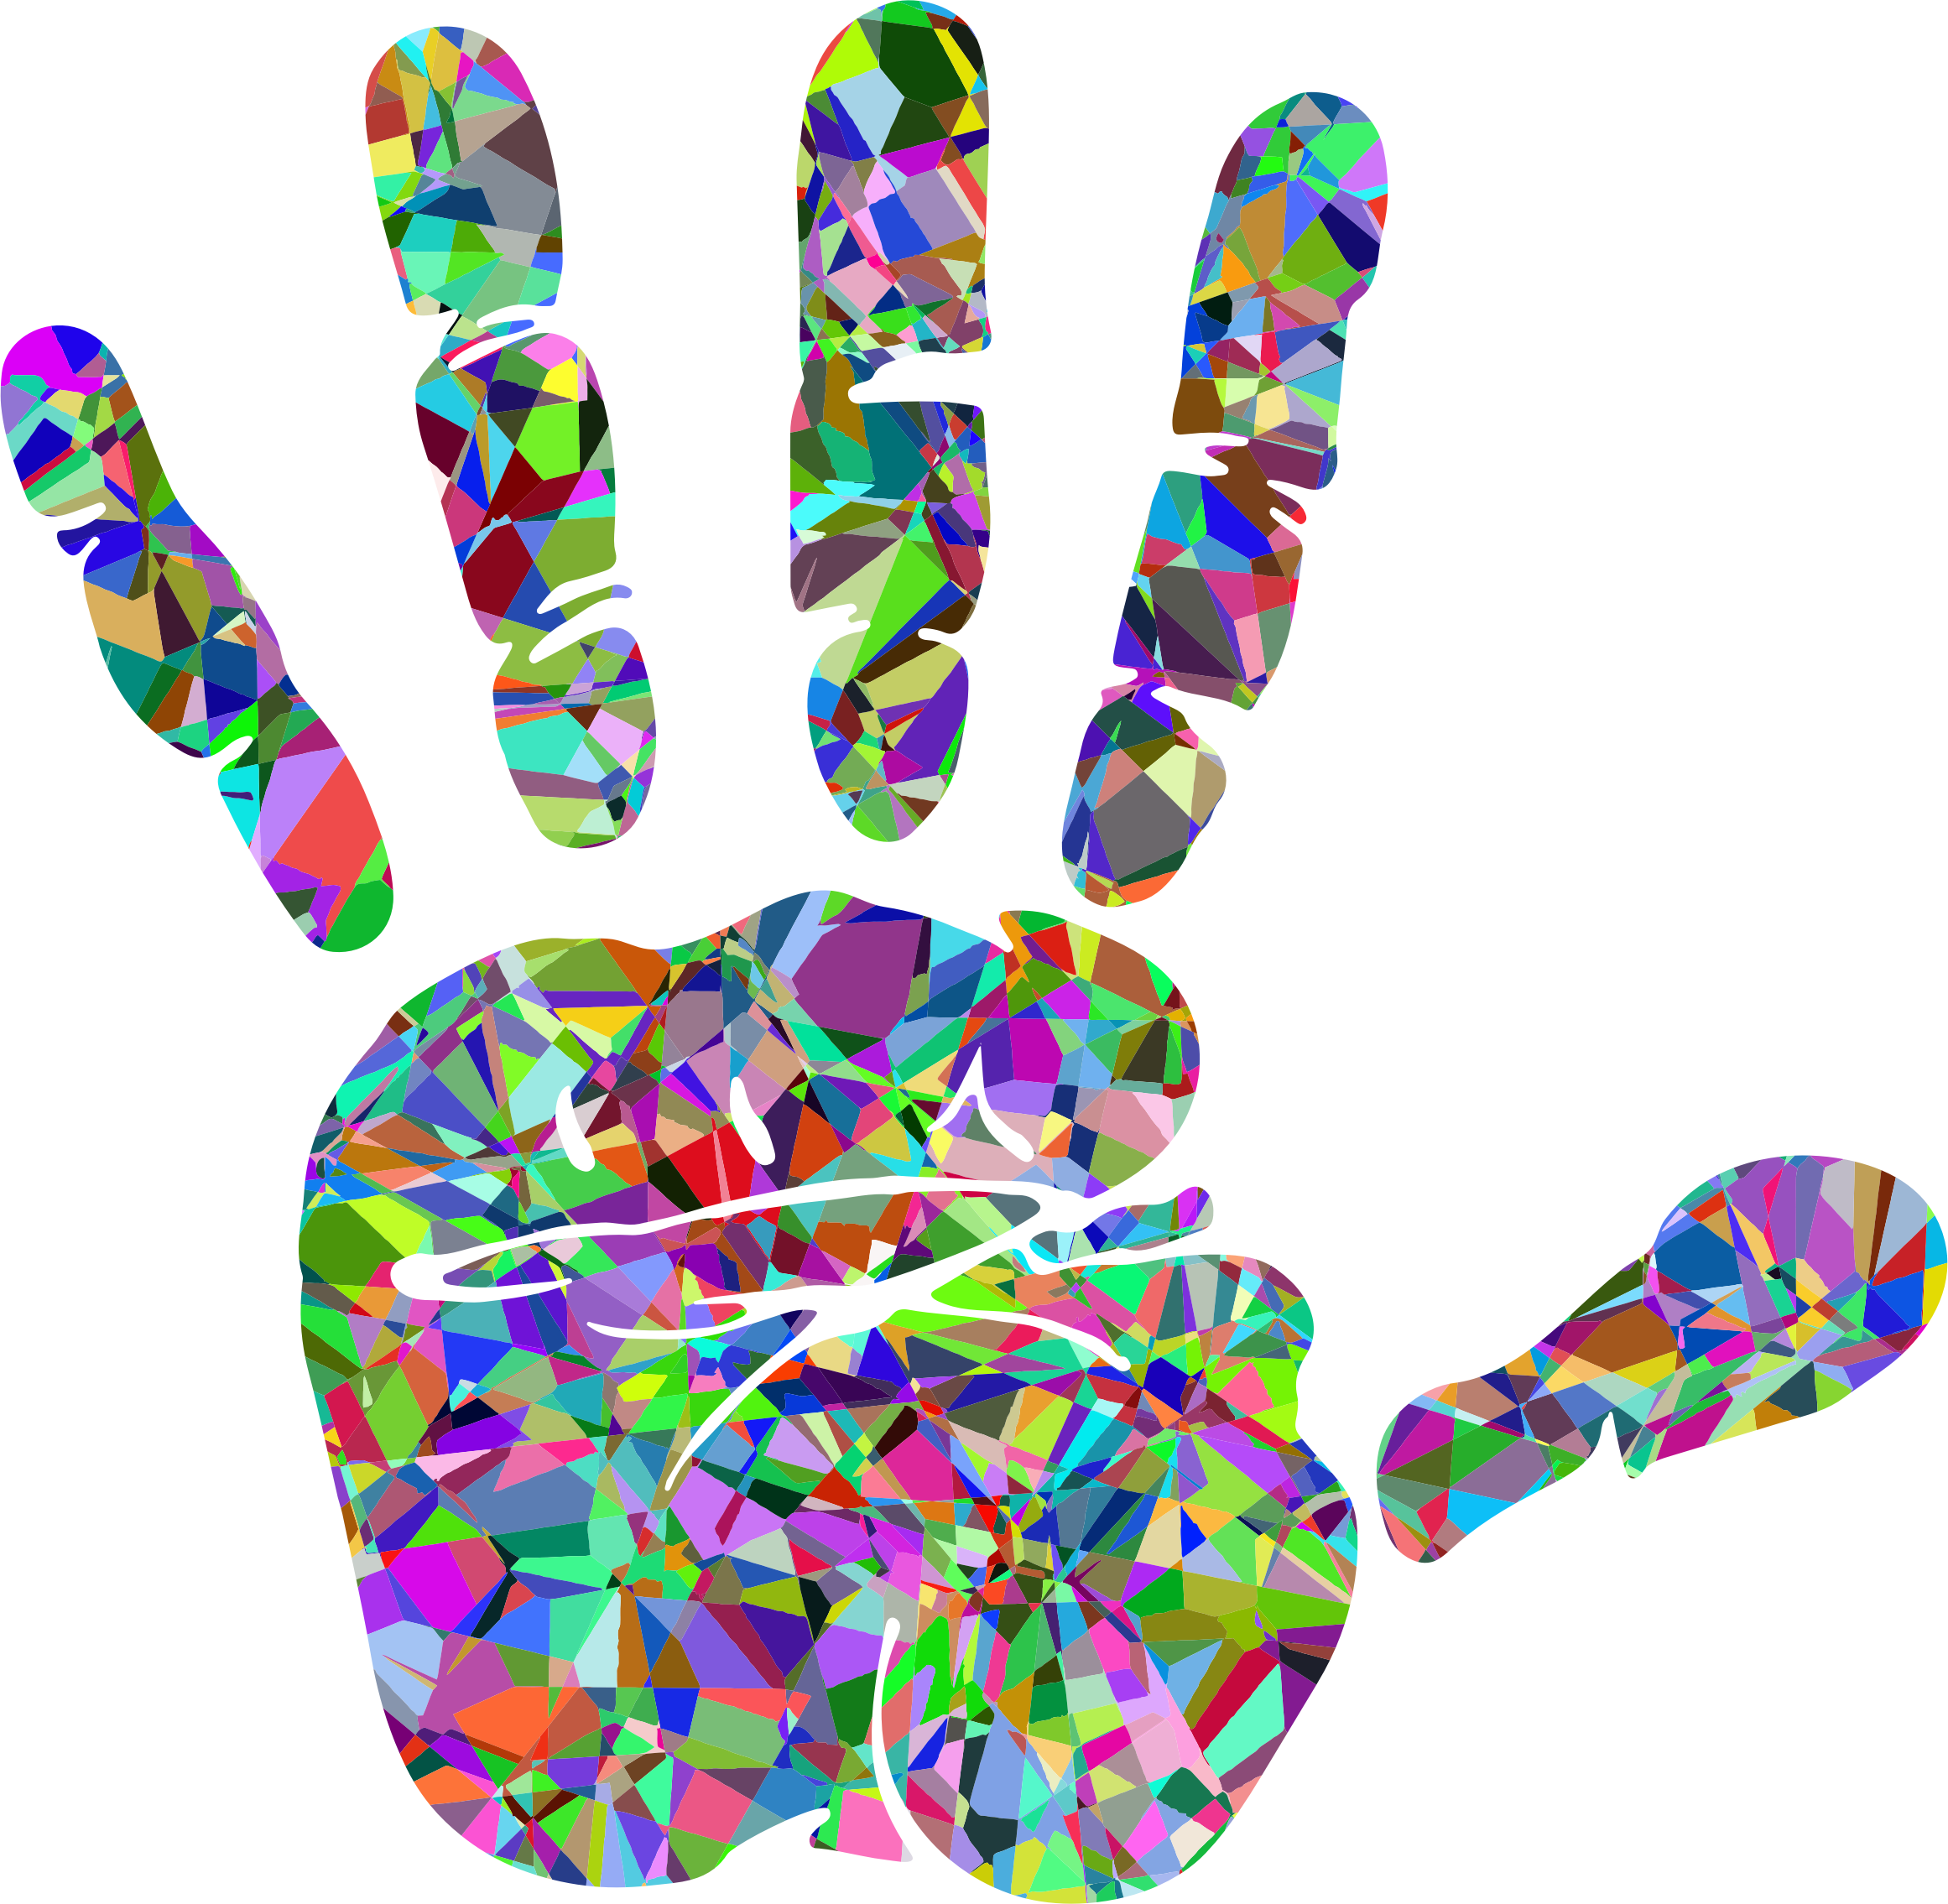 Technicolor big image png. Handprint clipart silhouette